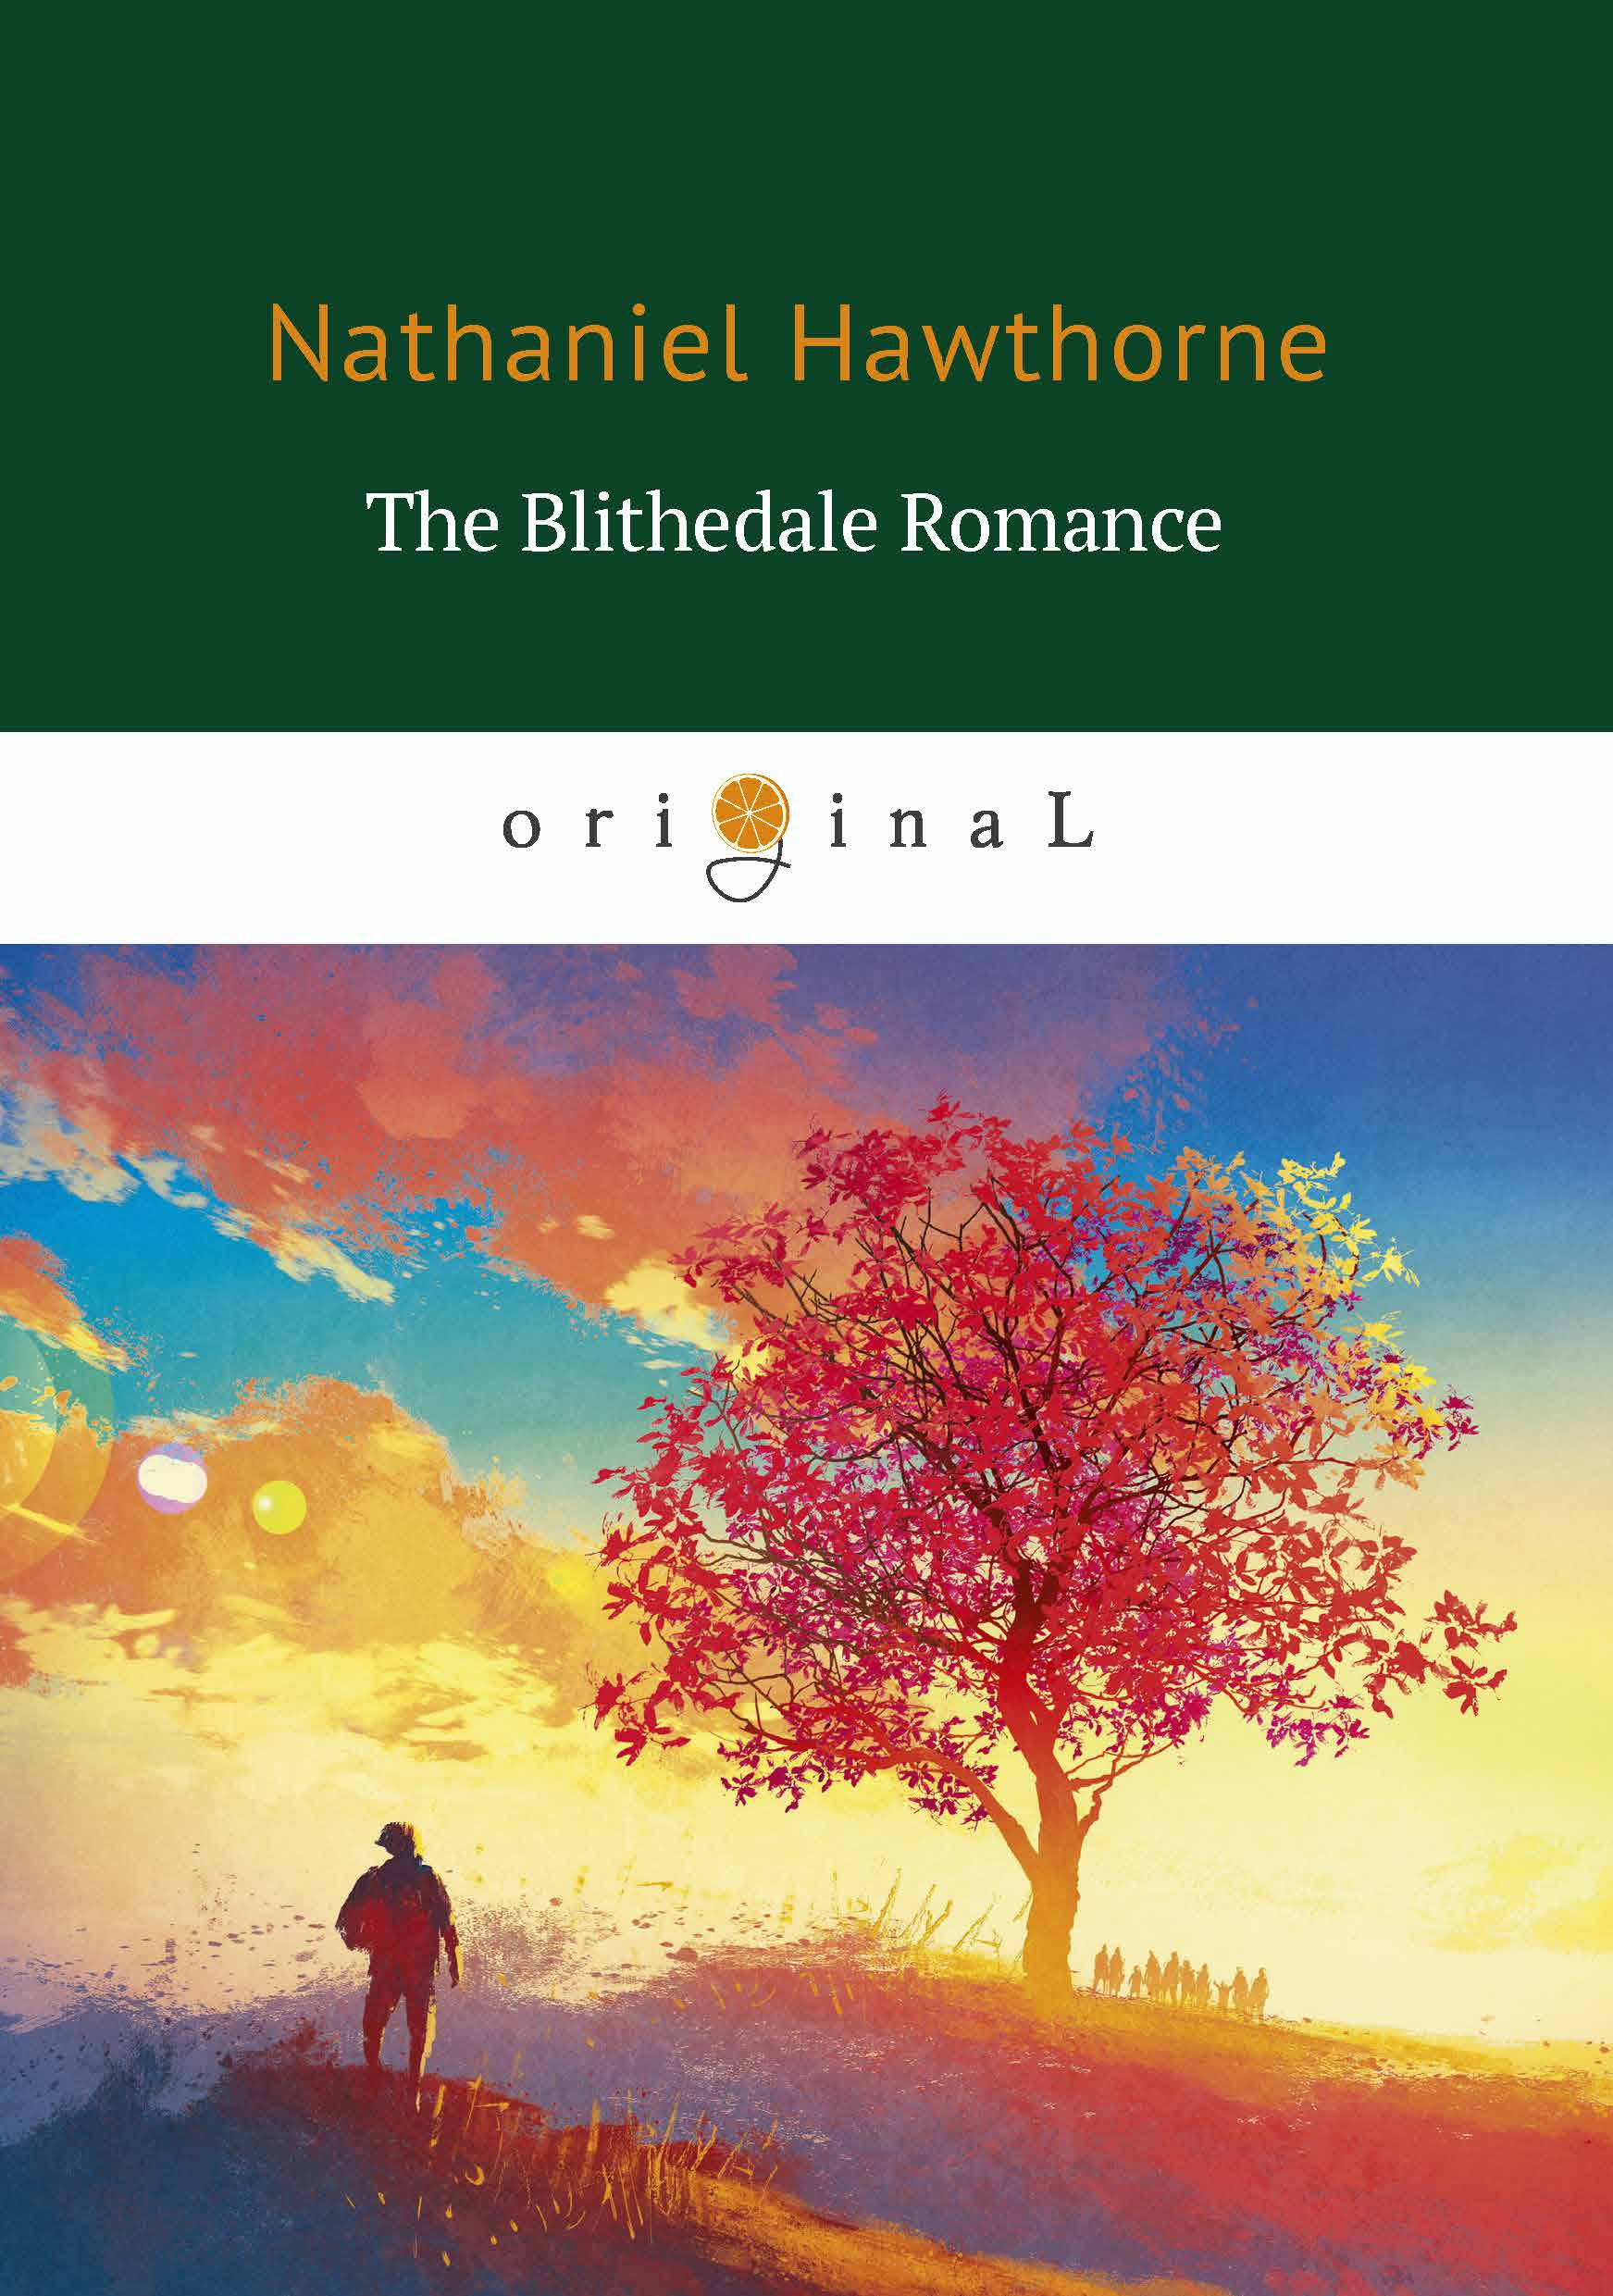 Nathaniel Hawthorne The Blithedale Romance